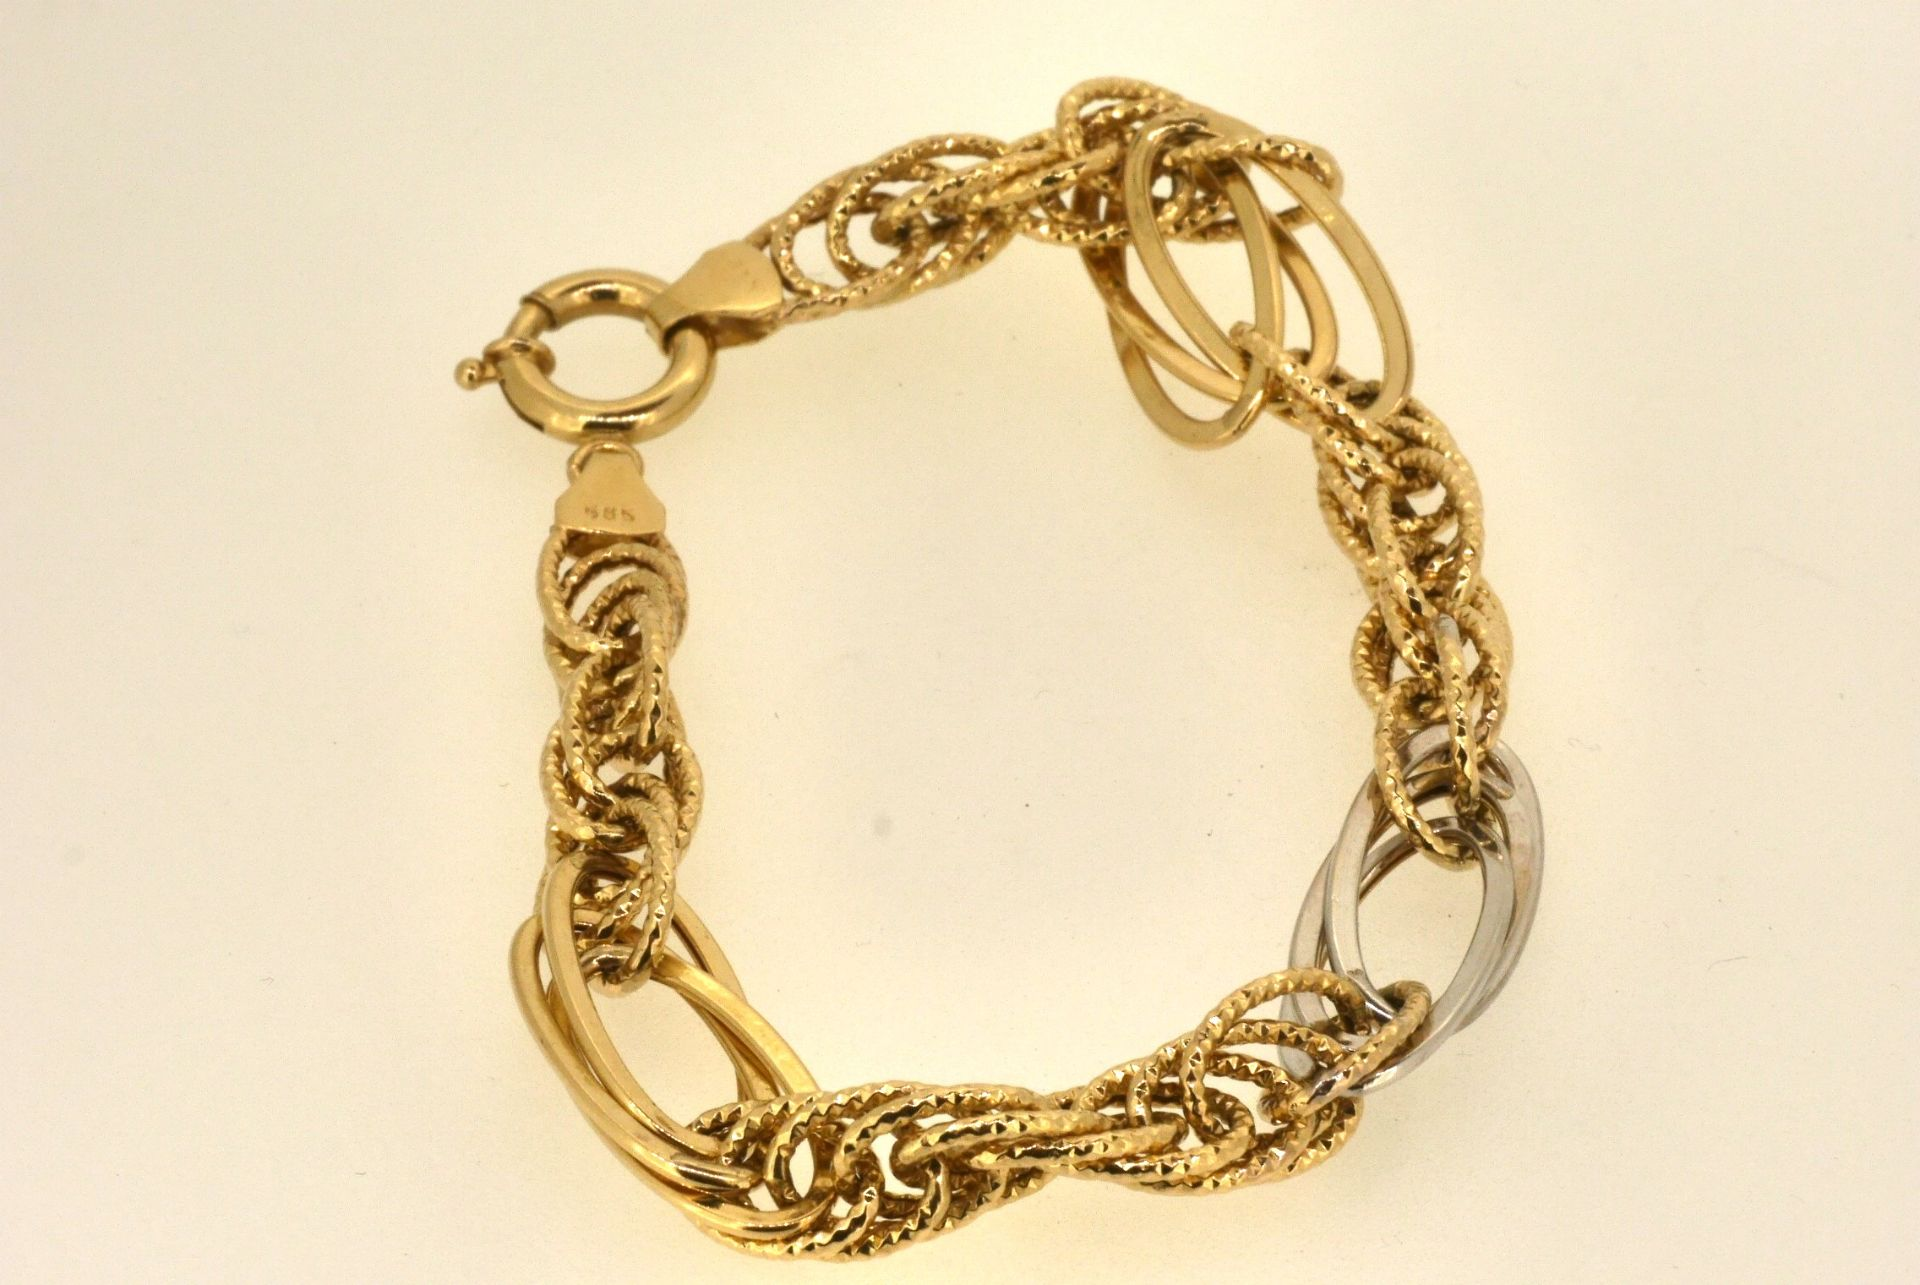 Armband WG/GG 585, 6,75 Gramm